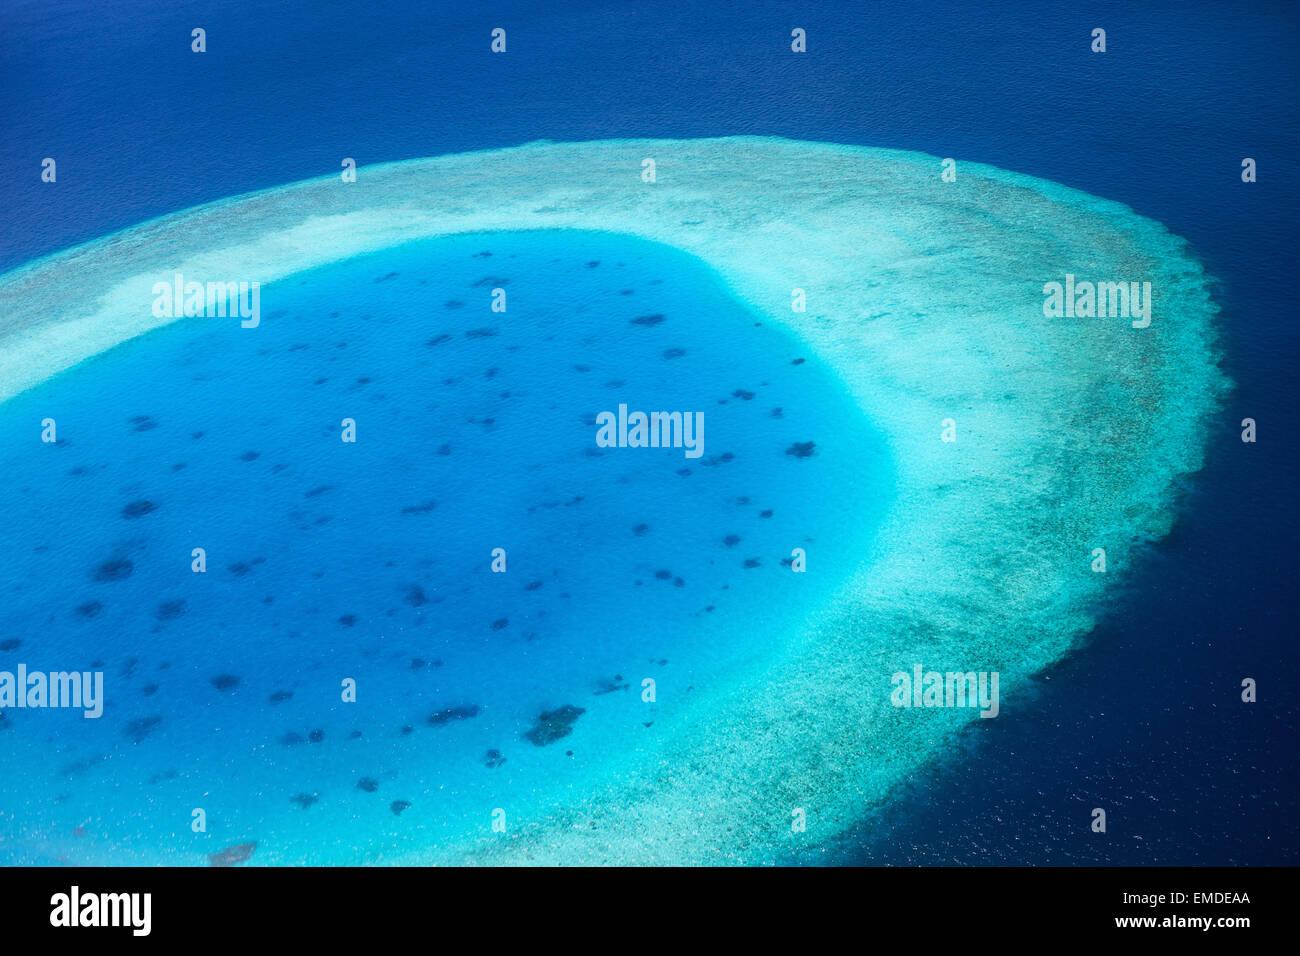 Aerial view of Maldives atoll - Stock Image